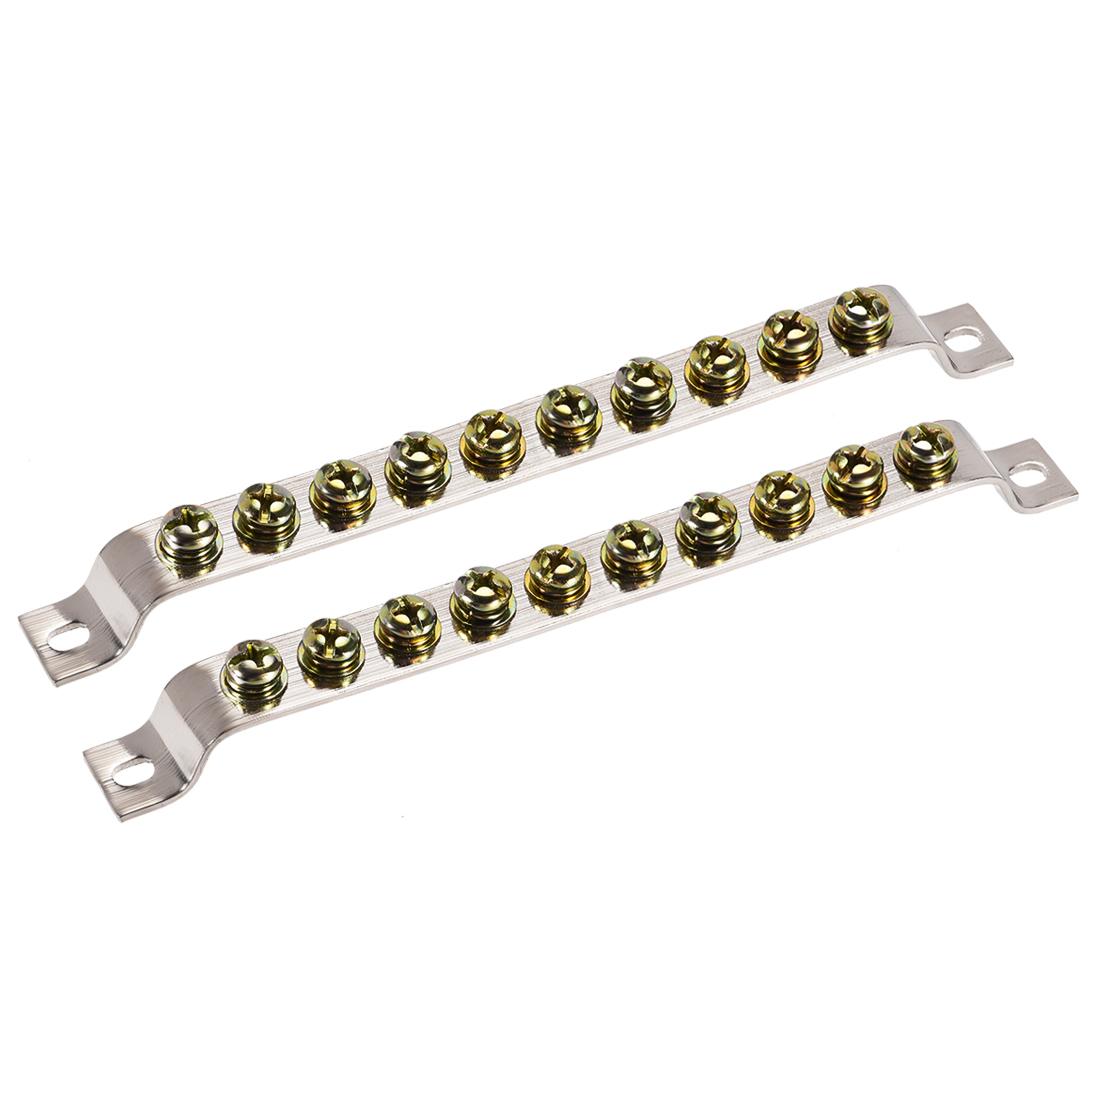 10 Positions Ground Wire Bridge Design Terminal Block Connector Bar 2 Pcs